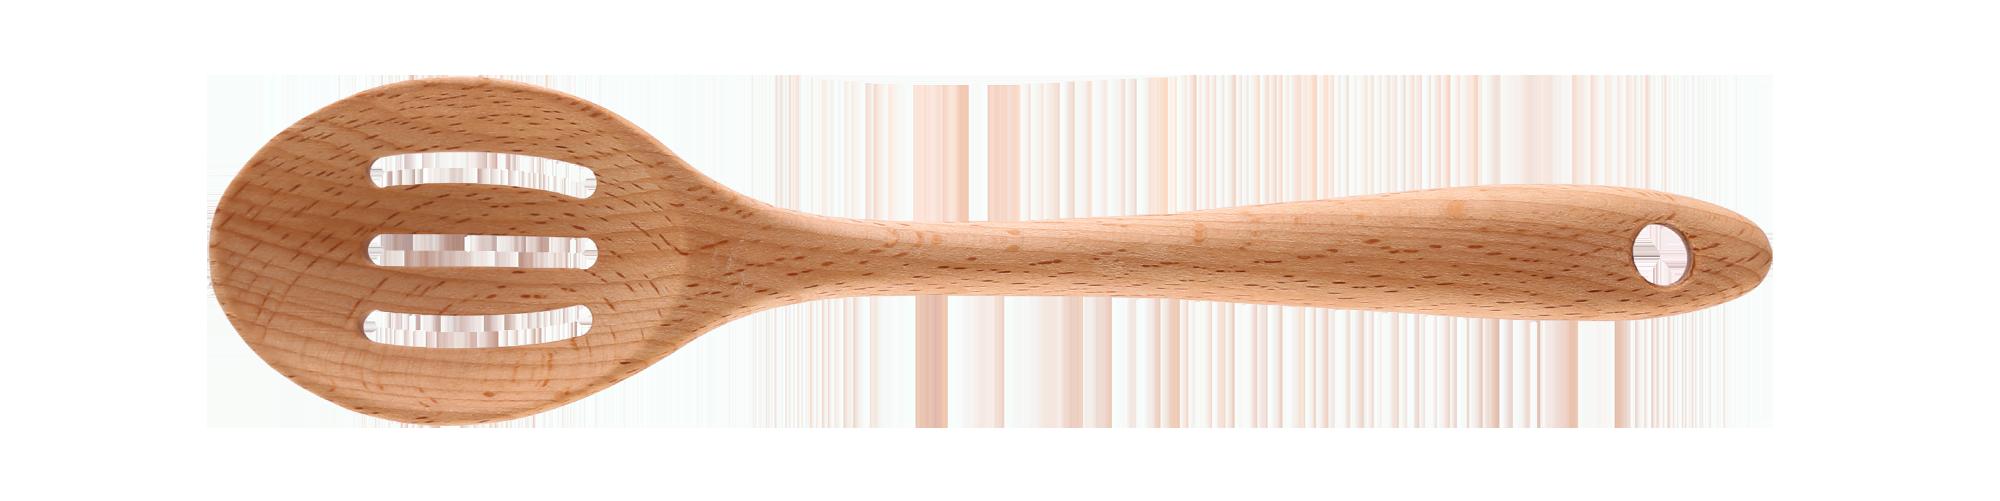 Selective_Wooden_Packshoot_highres_Slottedspoon